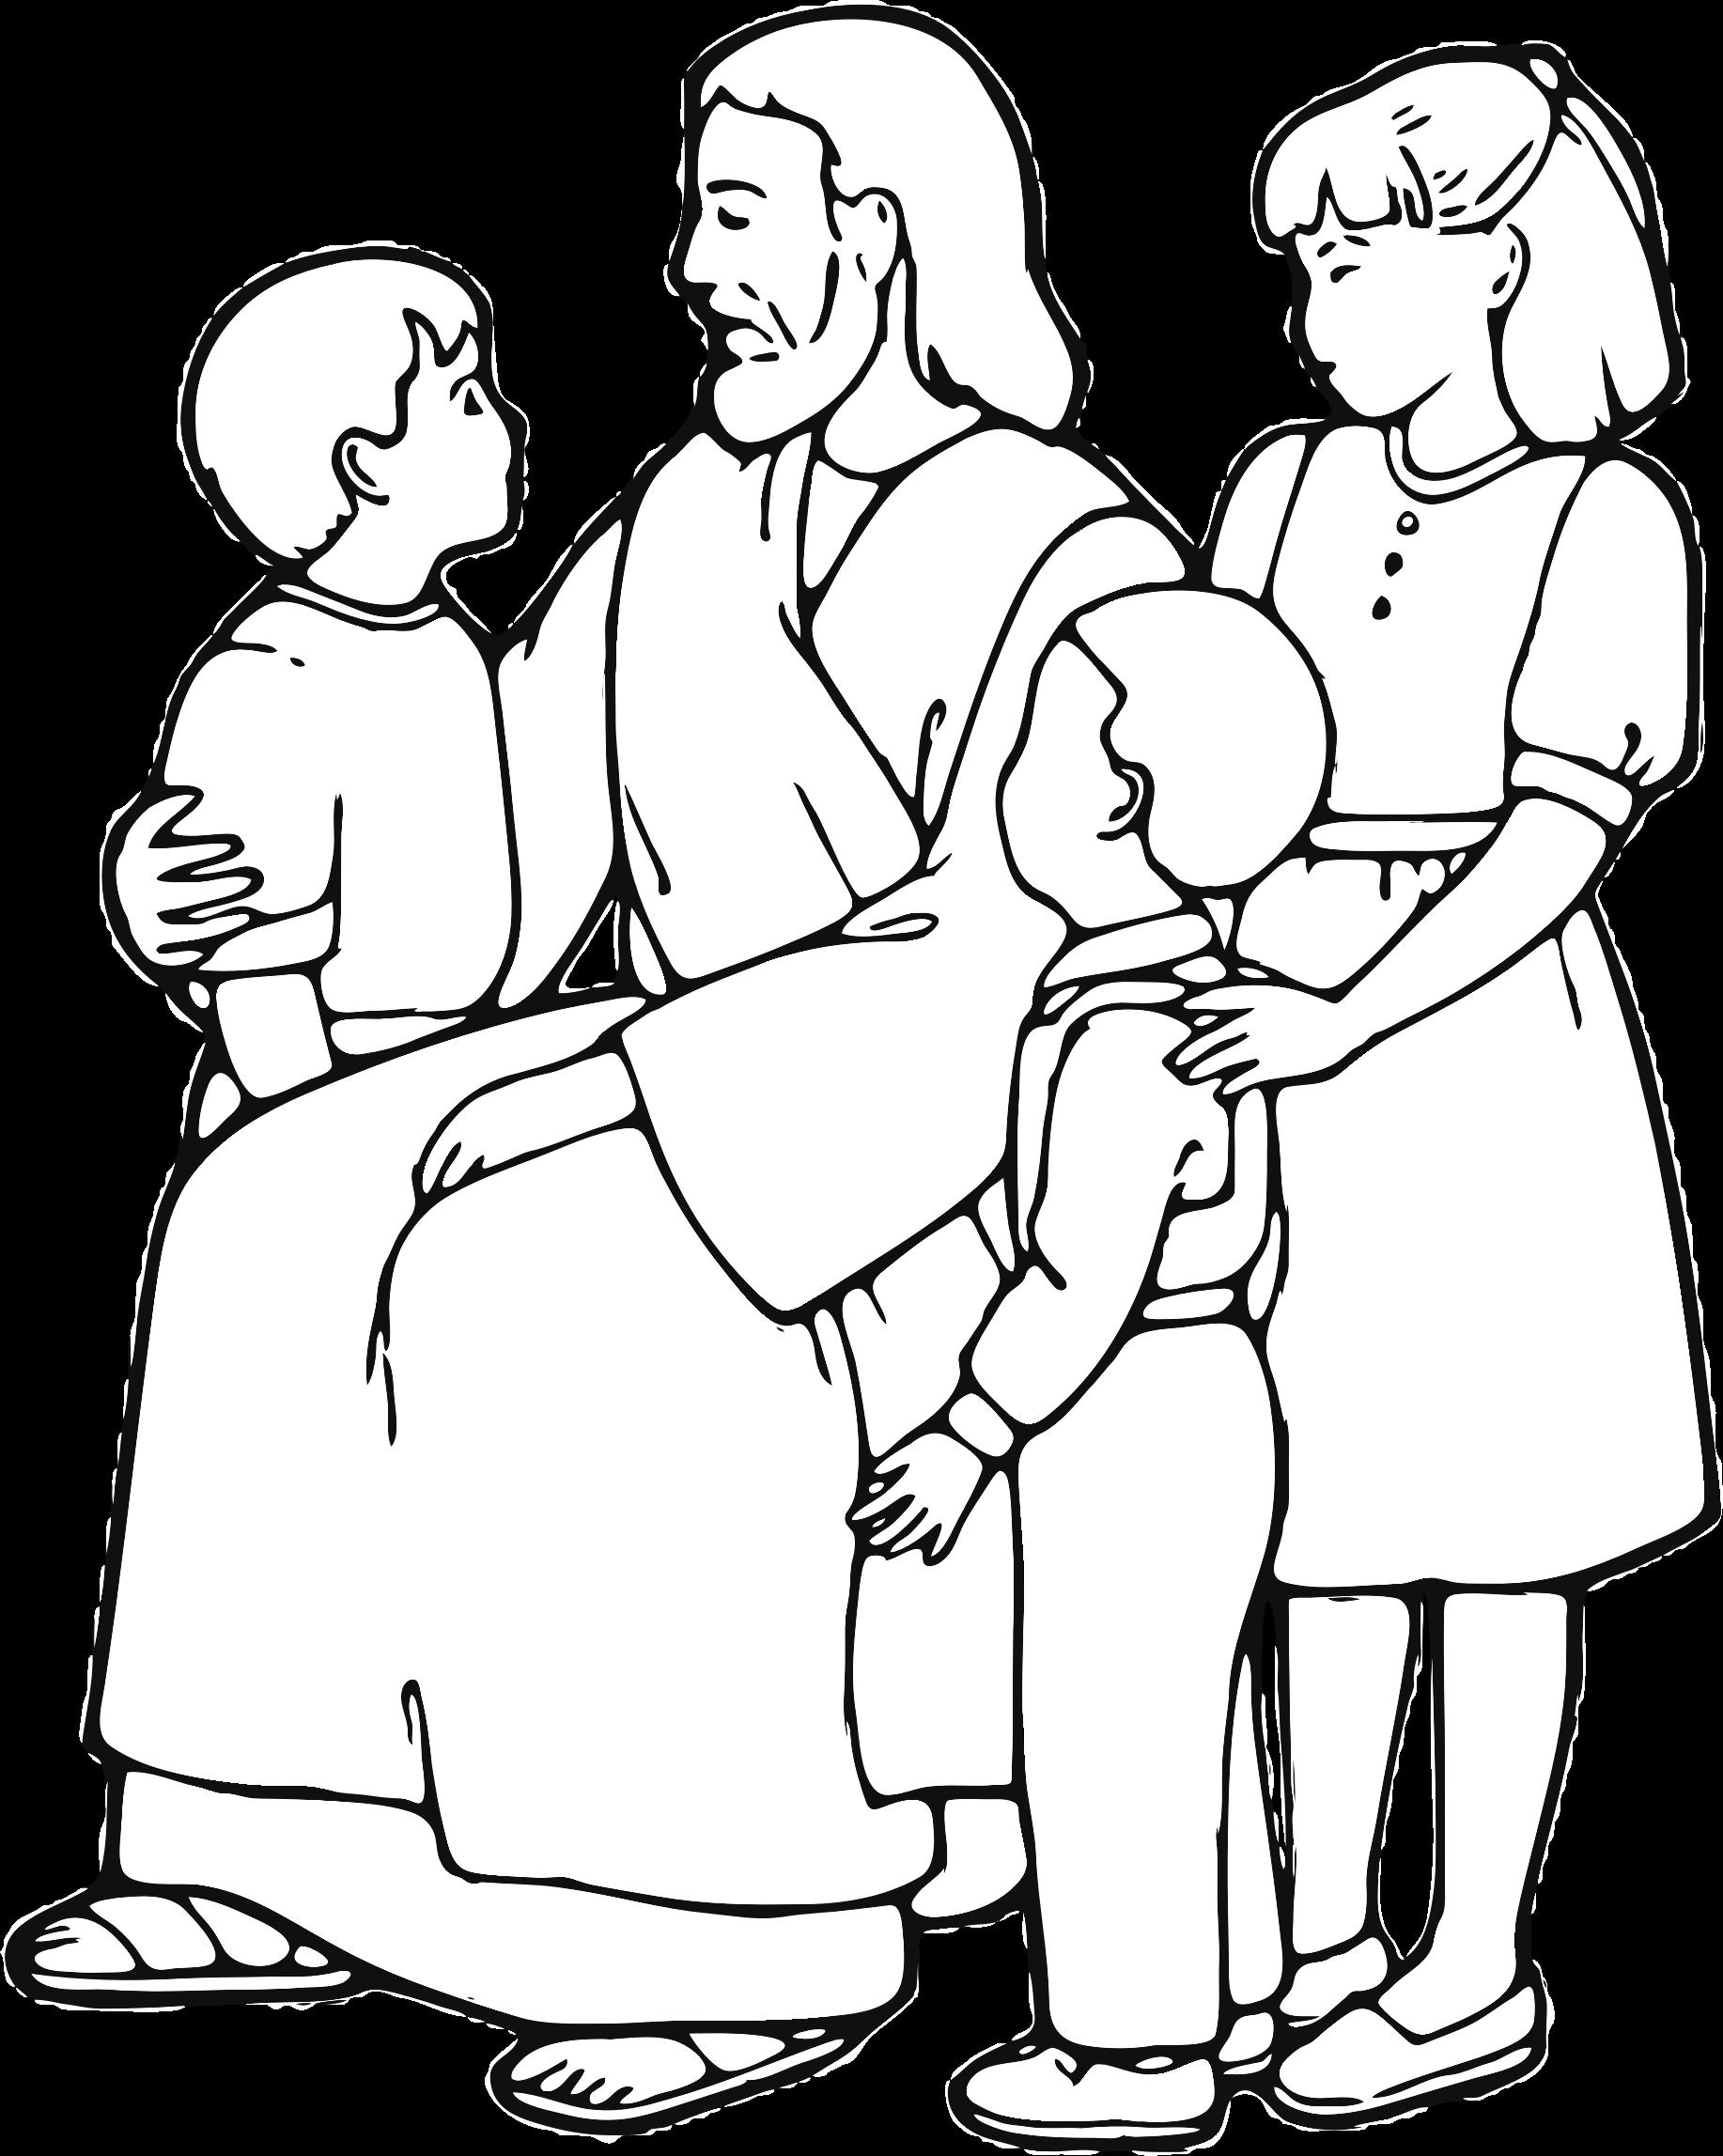 1834x2295 Jesus Teaching Children Line Art By @gdj, From Pixabay.,